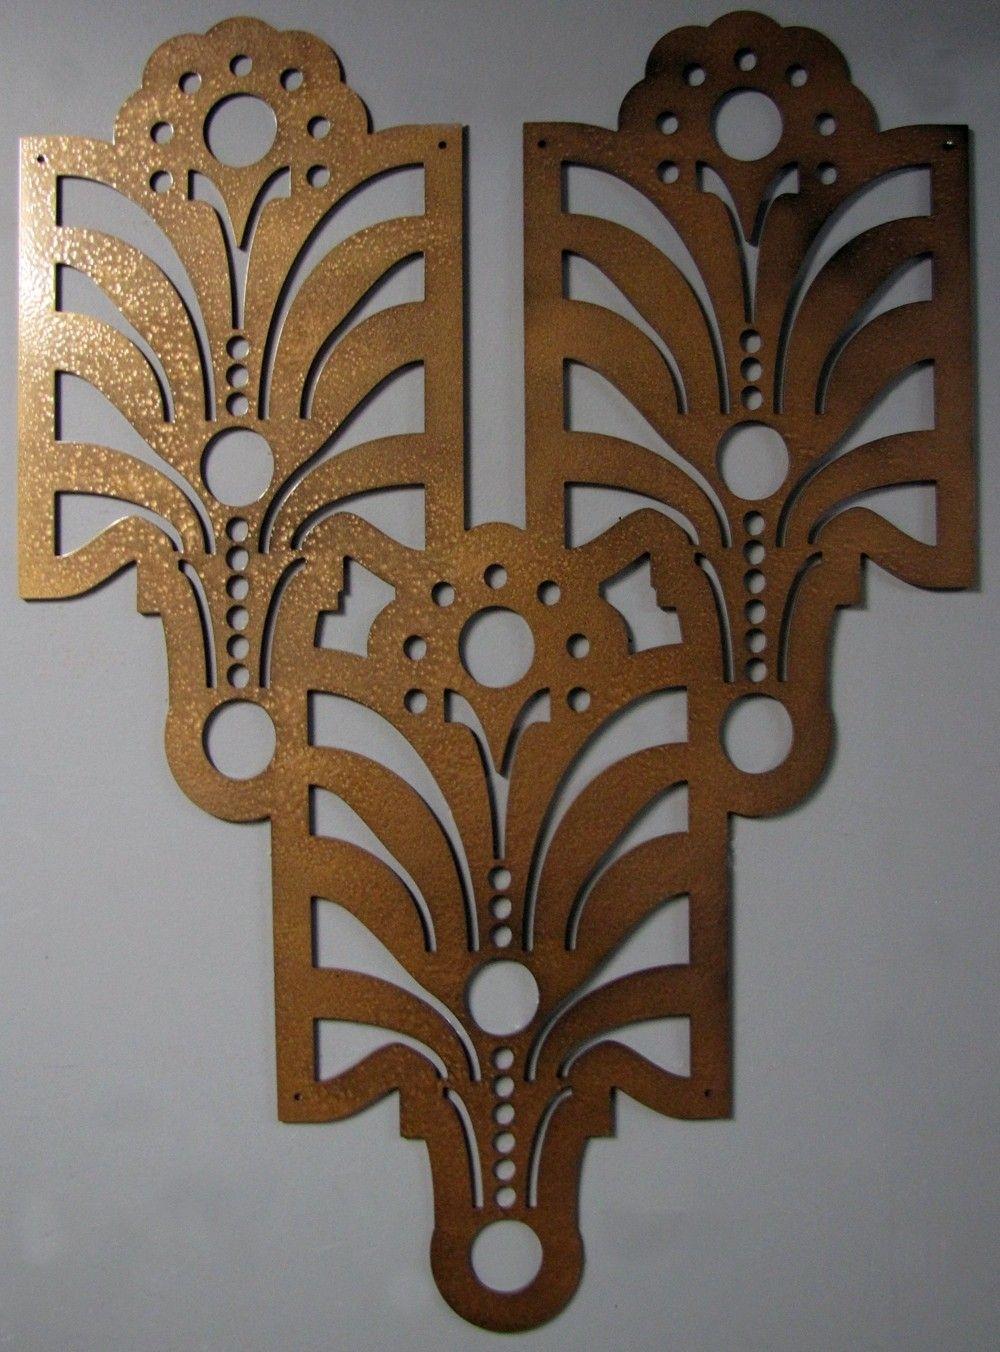 Deco Metal Wall Art | Art Deco | Pinterest | Metal Wall Art, Metal Regarding 2018 Art Deco Wall Art (View 10 of 20)